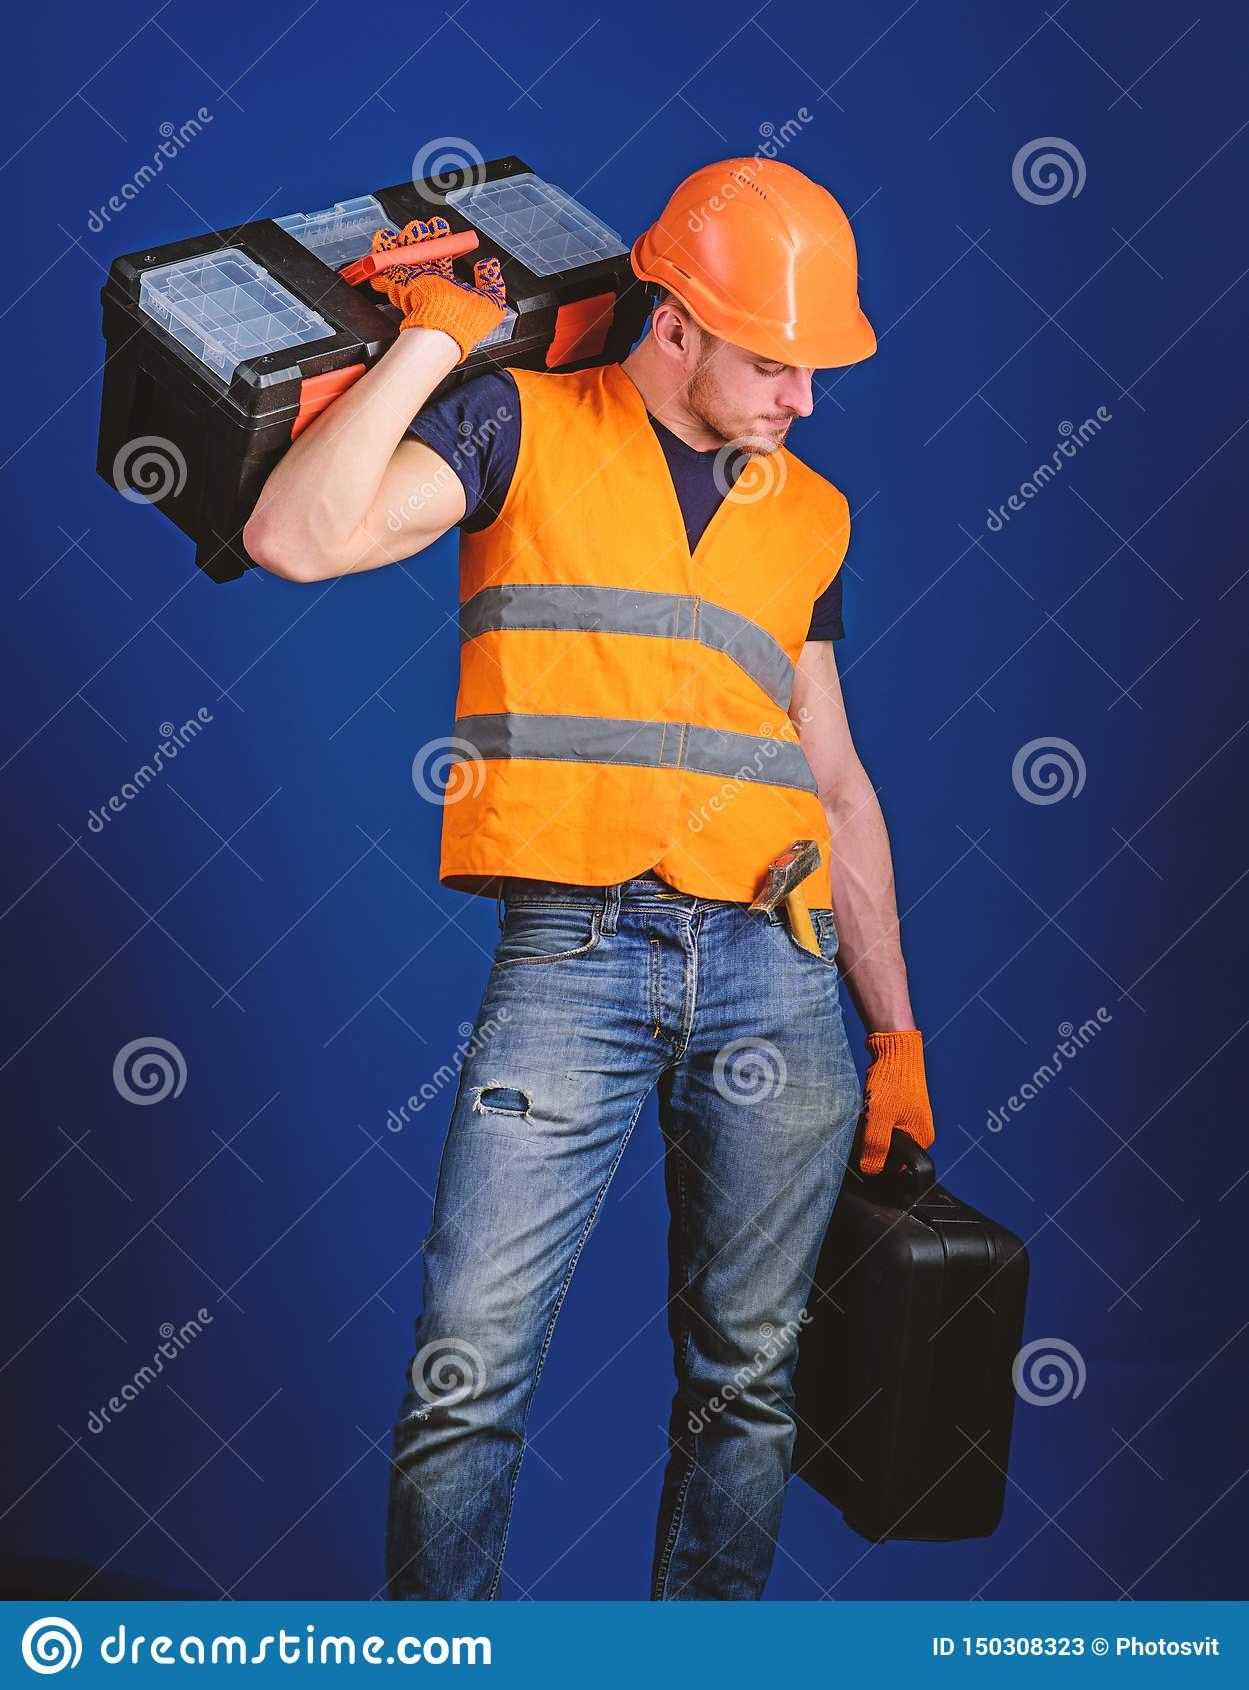 R 盔甲的人,安全帽拿着工具箱和手提箱有工具的,蓝色背景 工作者,修理匠